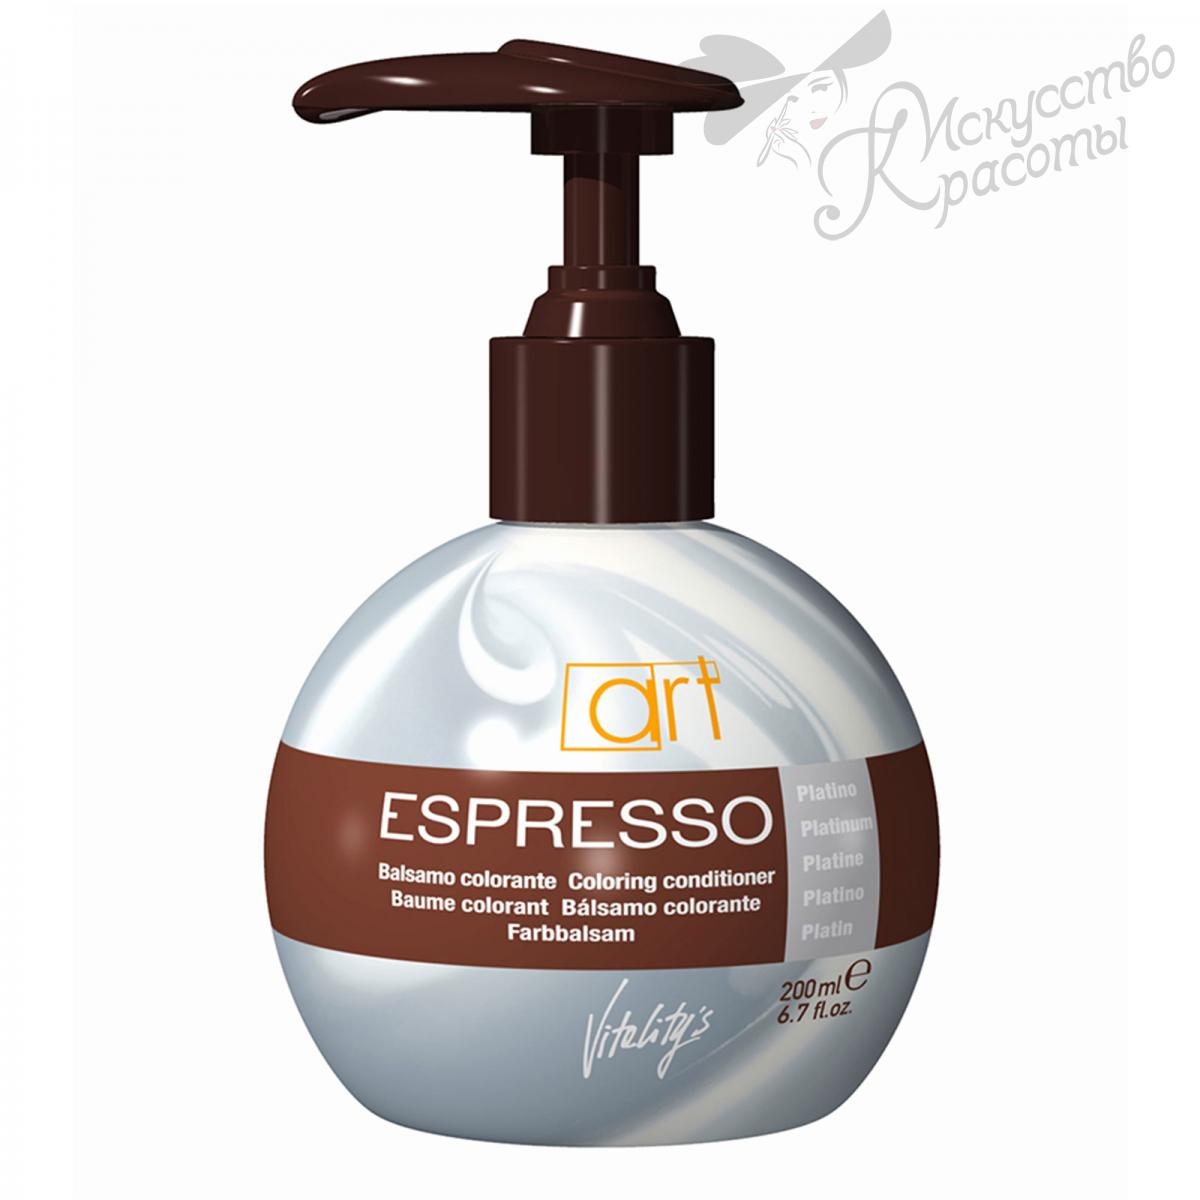 Оттеночный бальзам Vitality's Espresso 9.6 Platino 200 мл